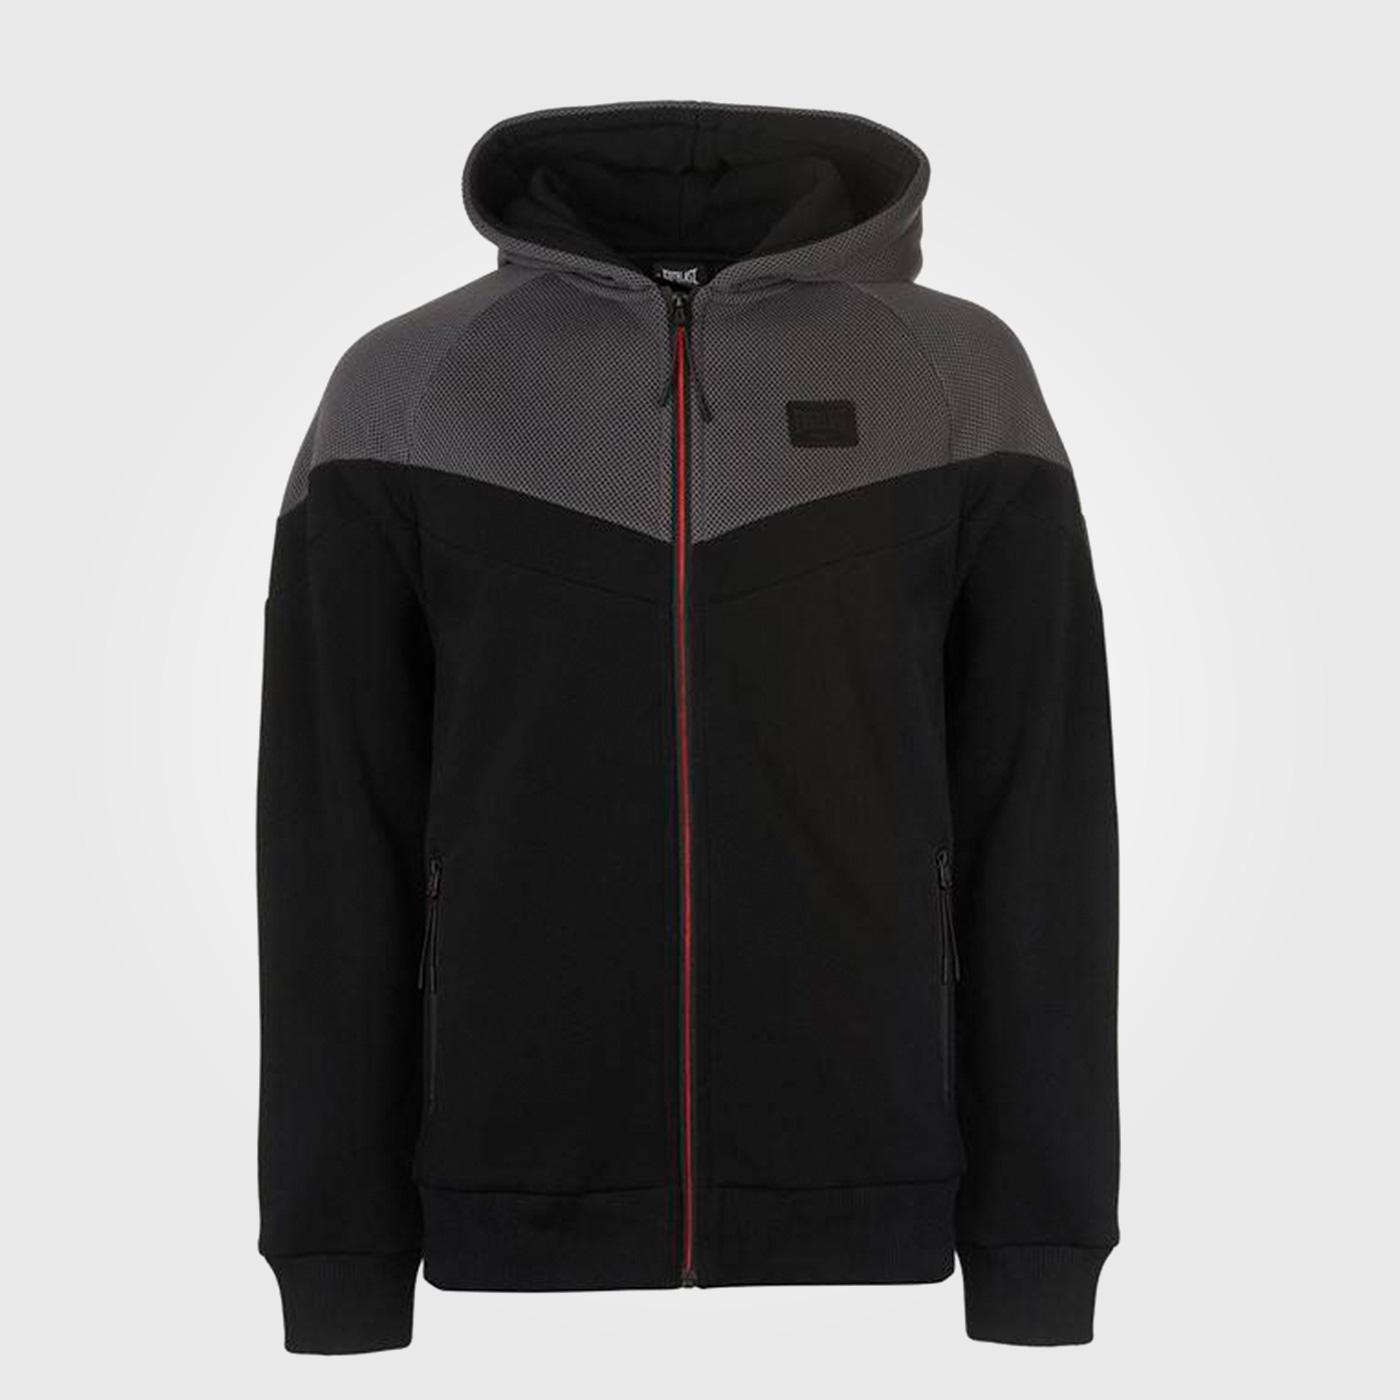 Толстовка Everlast Premium Zipped Mens Black